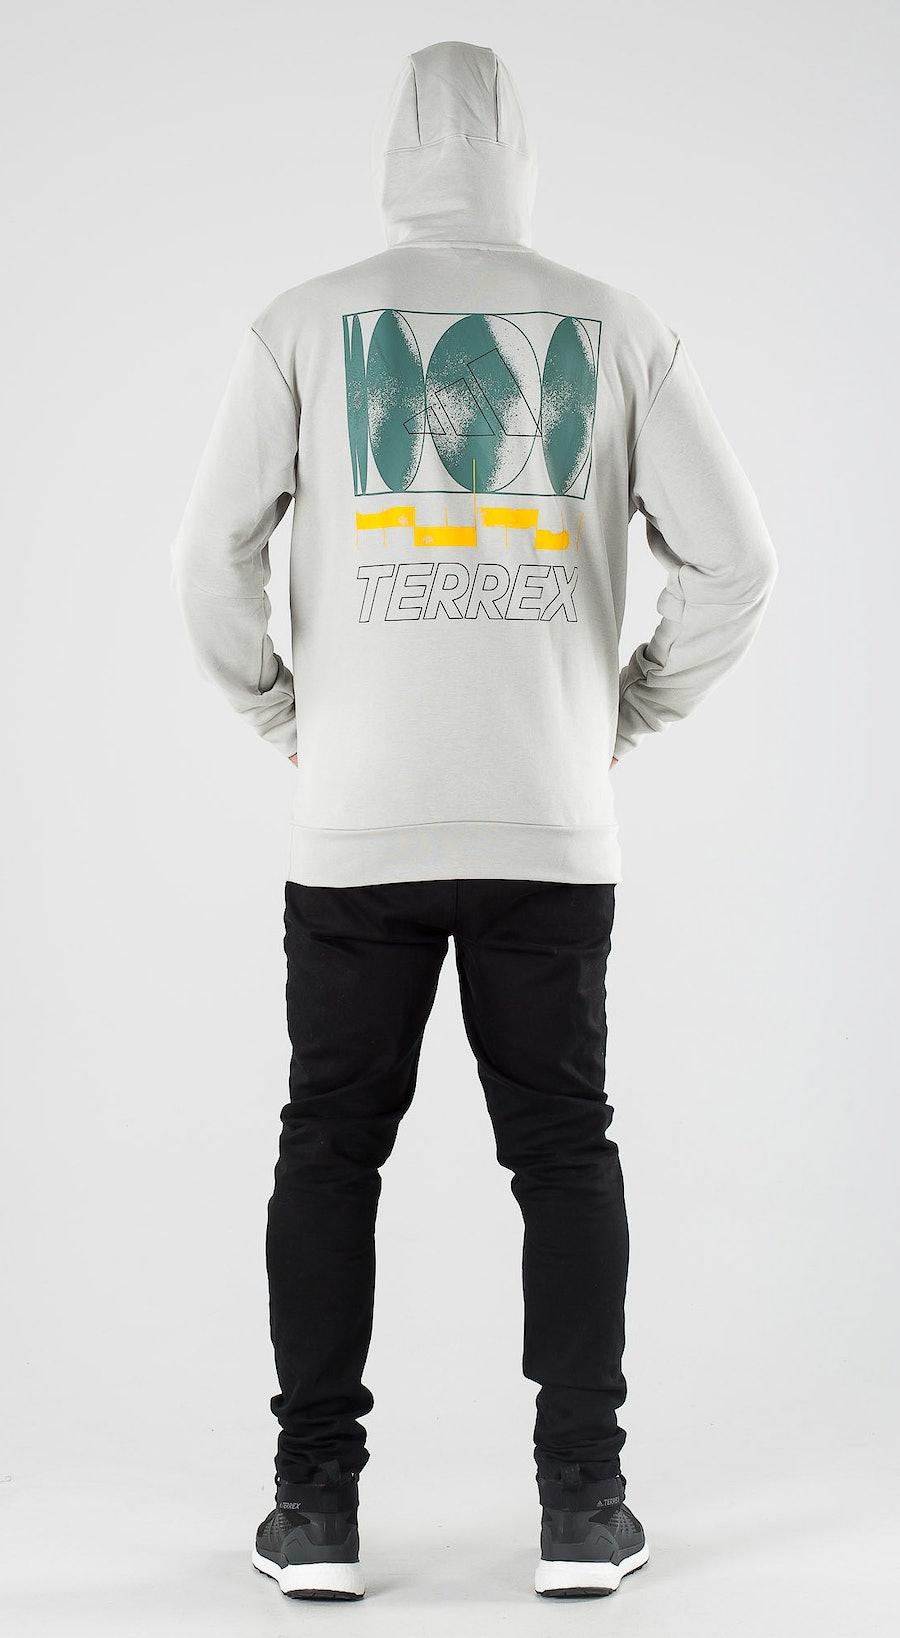 Adidas Terrex Terrex Logo Metal Grey Outfit Multi